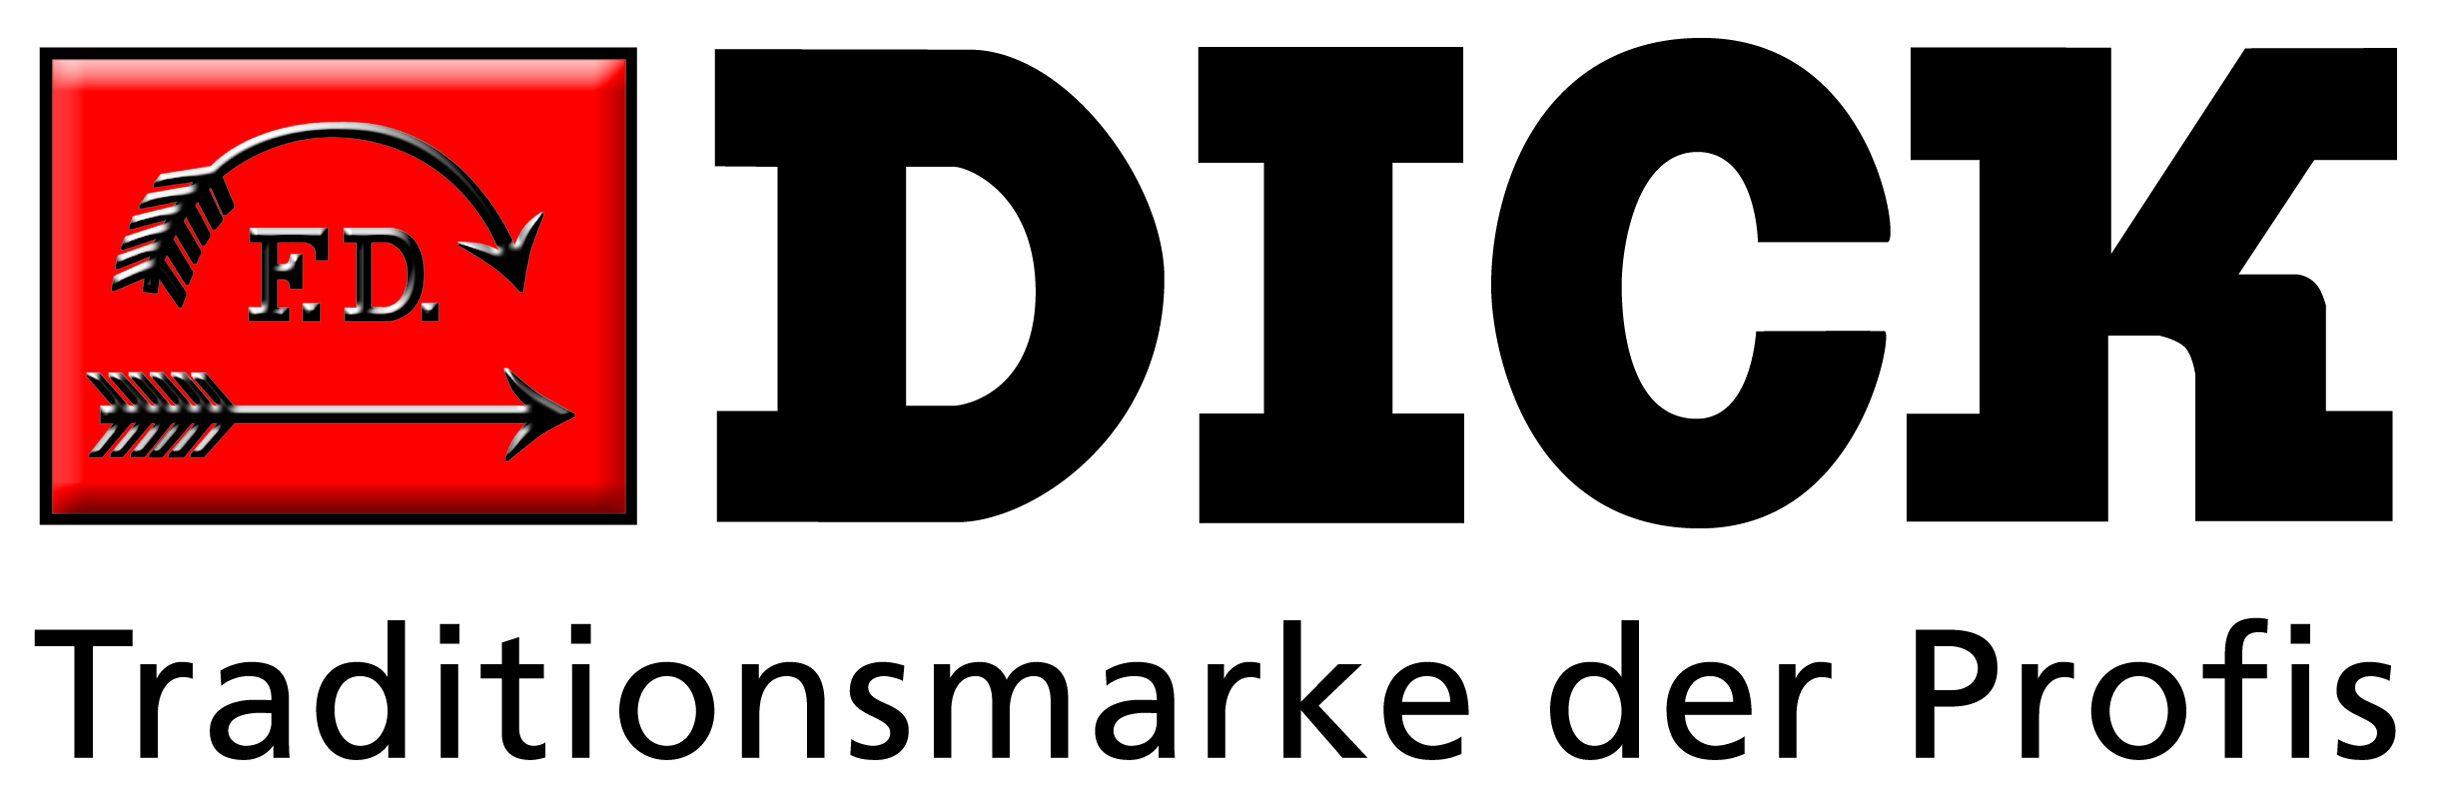 Friedr. Dick GmbH + Co. KG